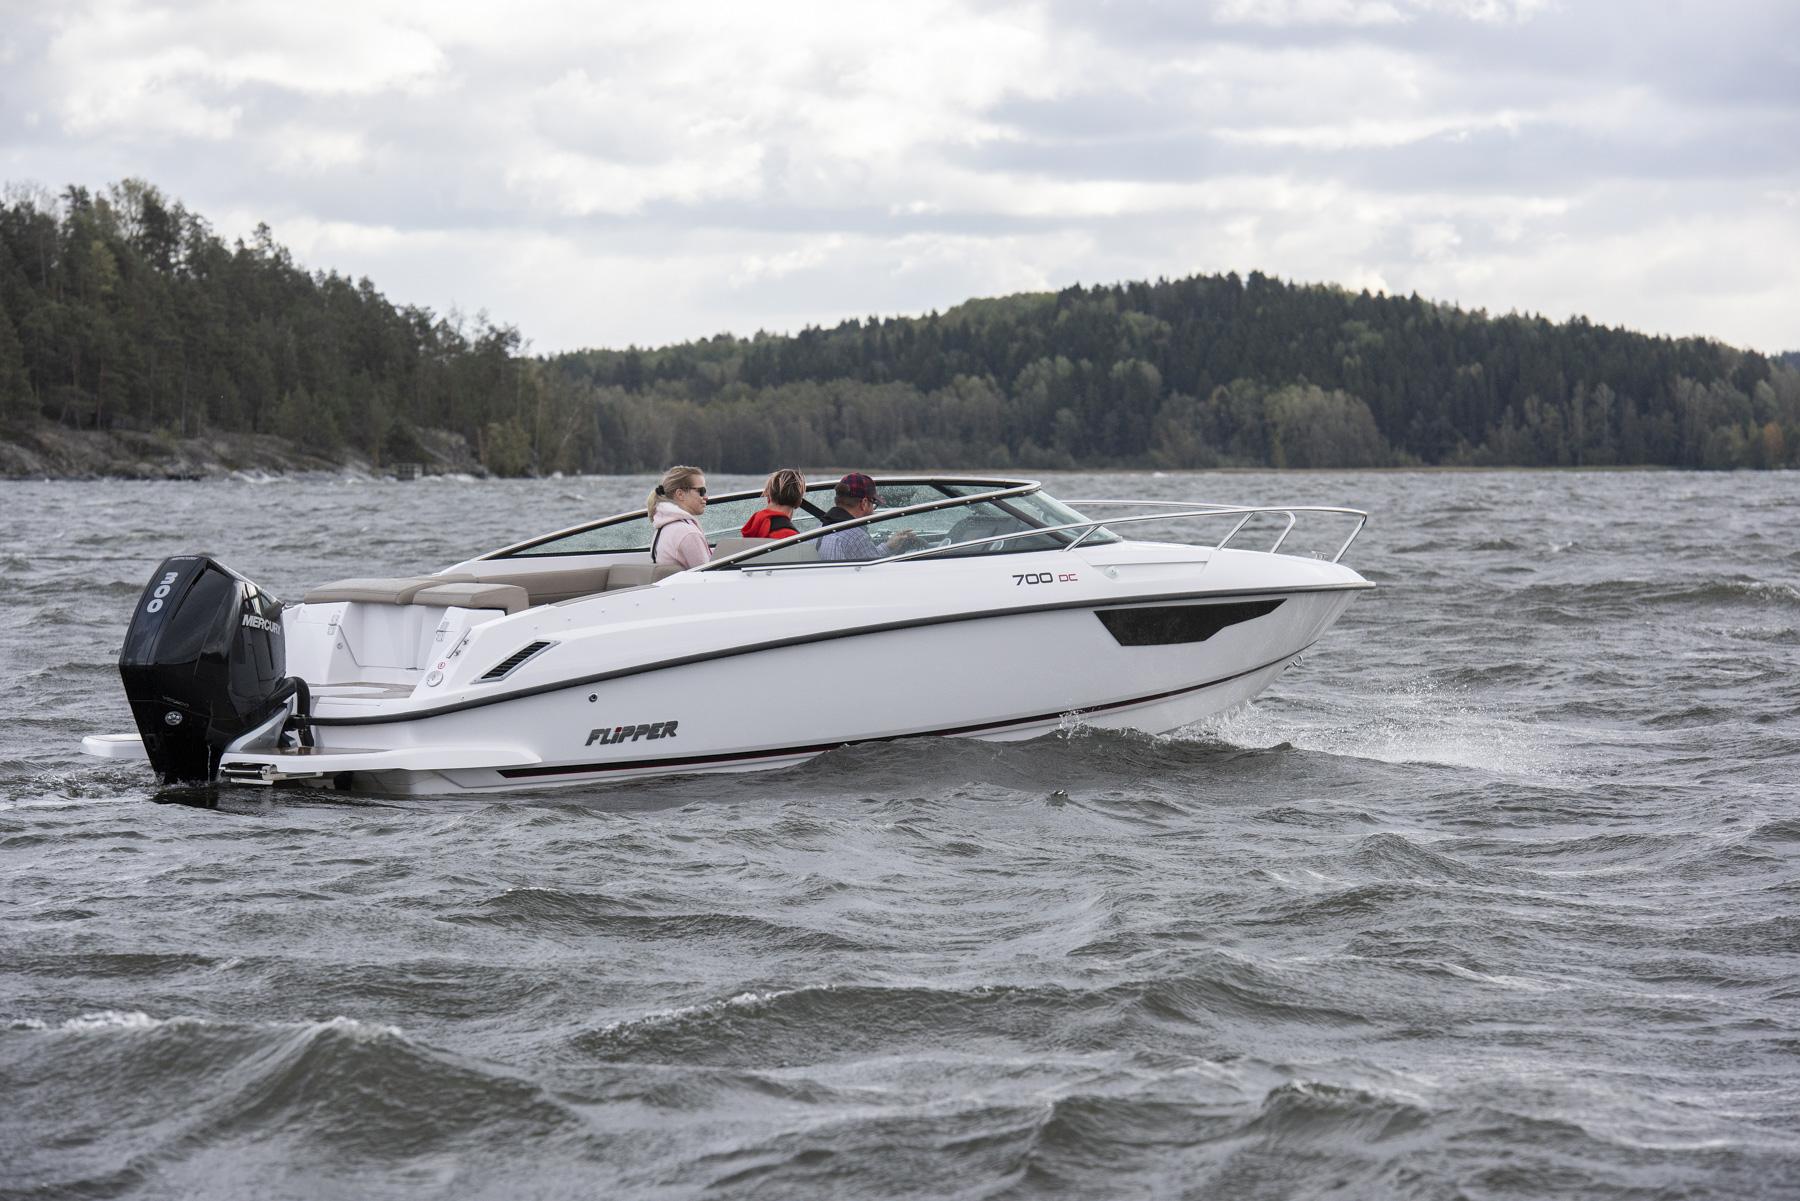 Flipper 700 Day Cruiser